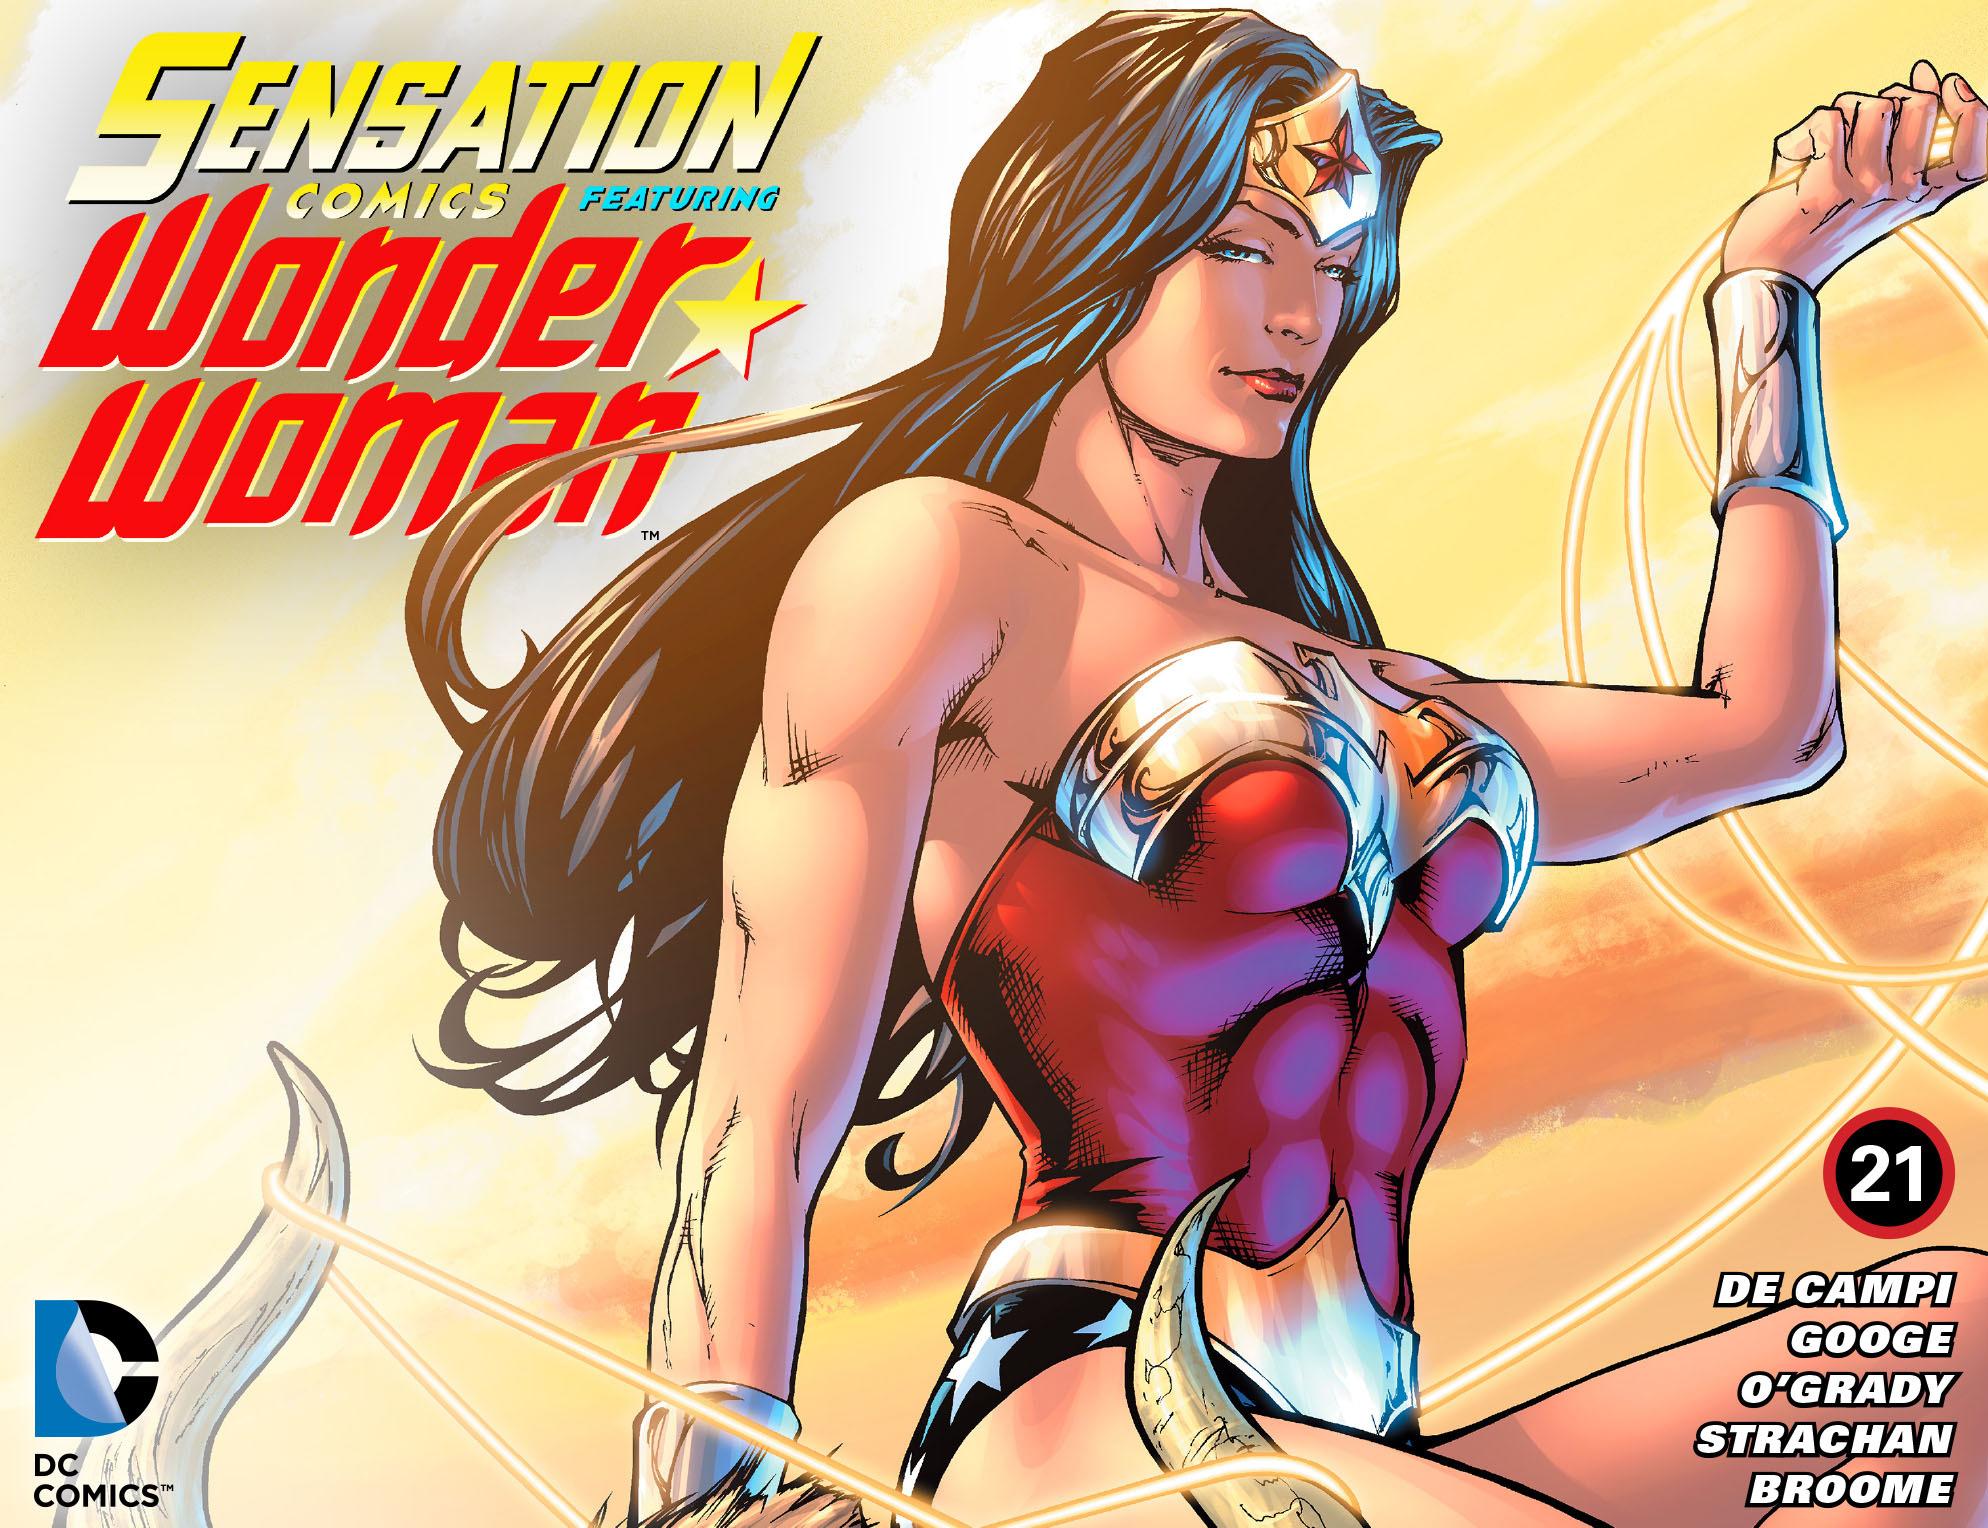 Read online Sensation Comics Featuring Wonder Woman comic -  Issue #21 - 1